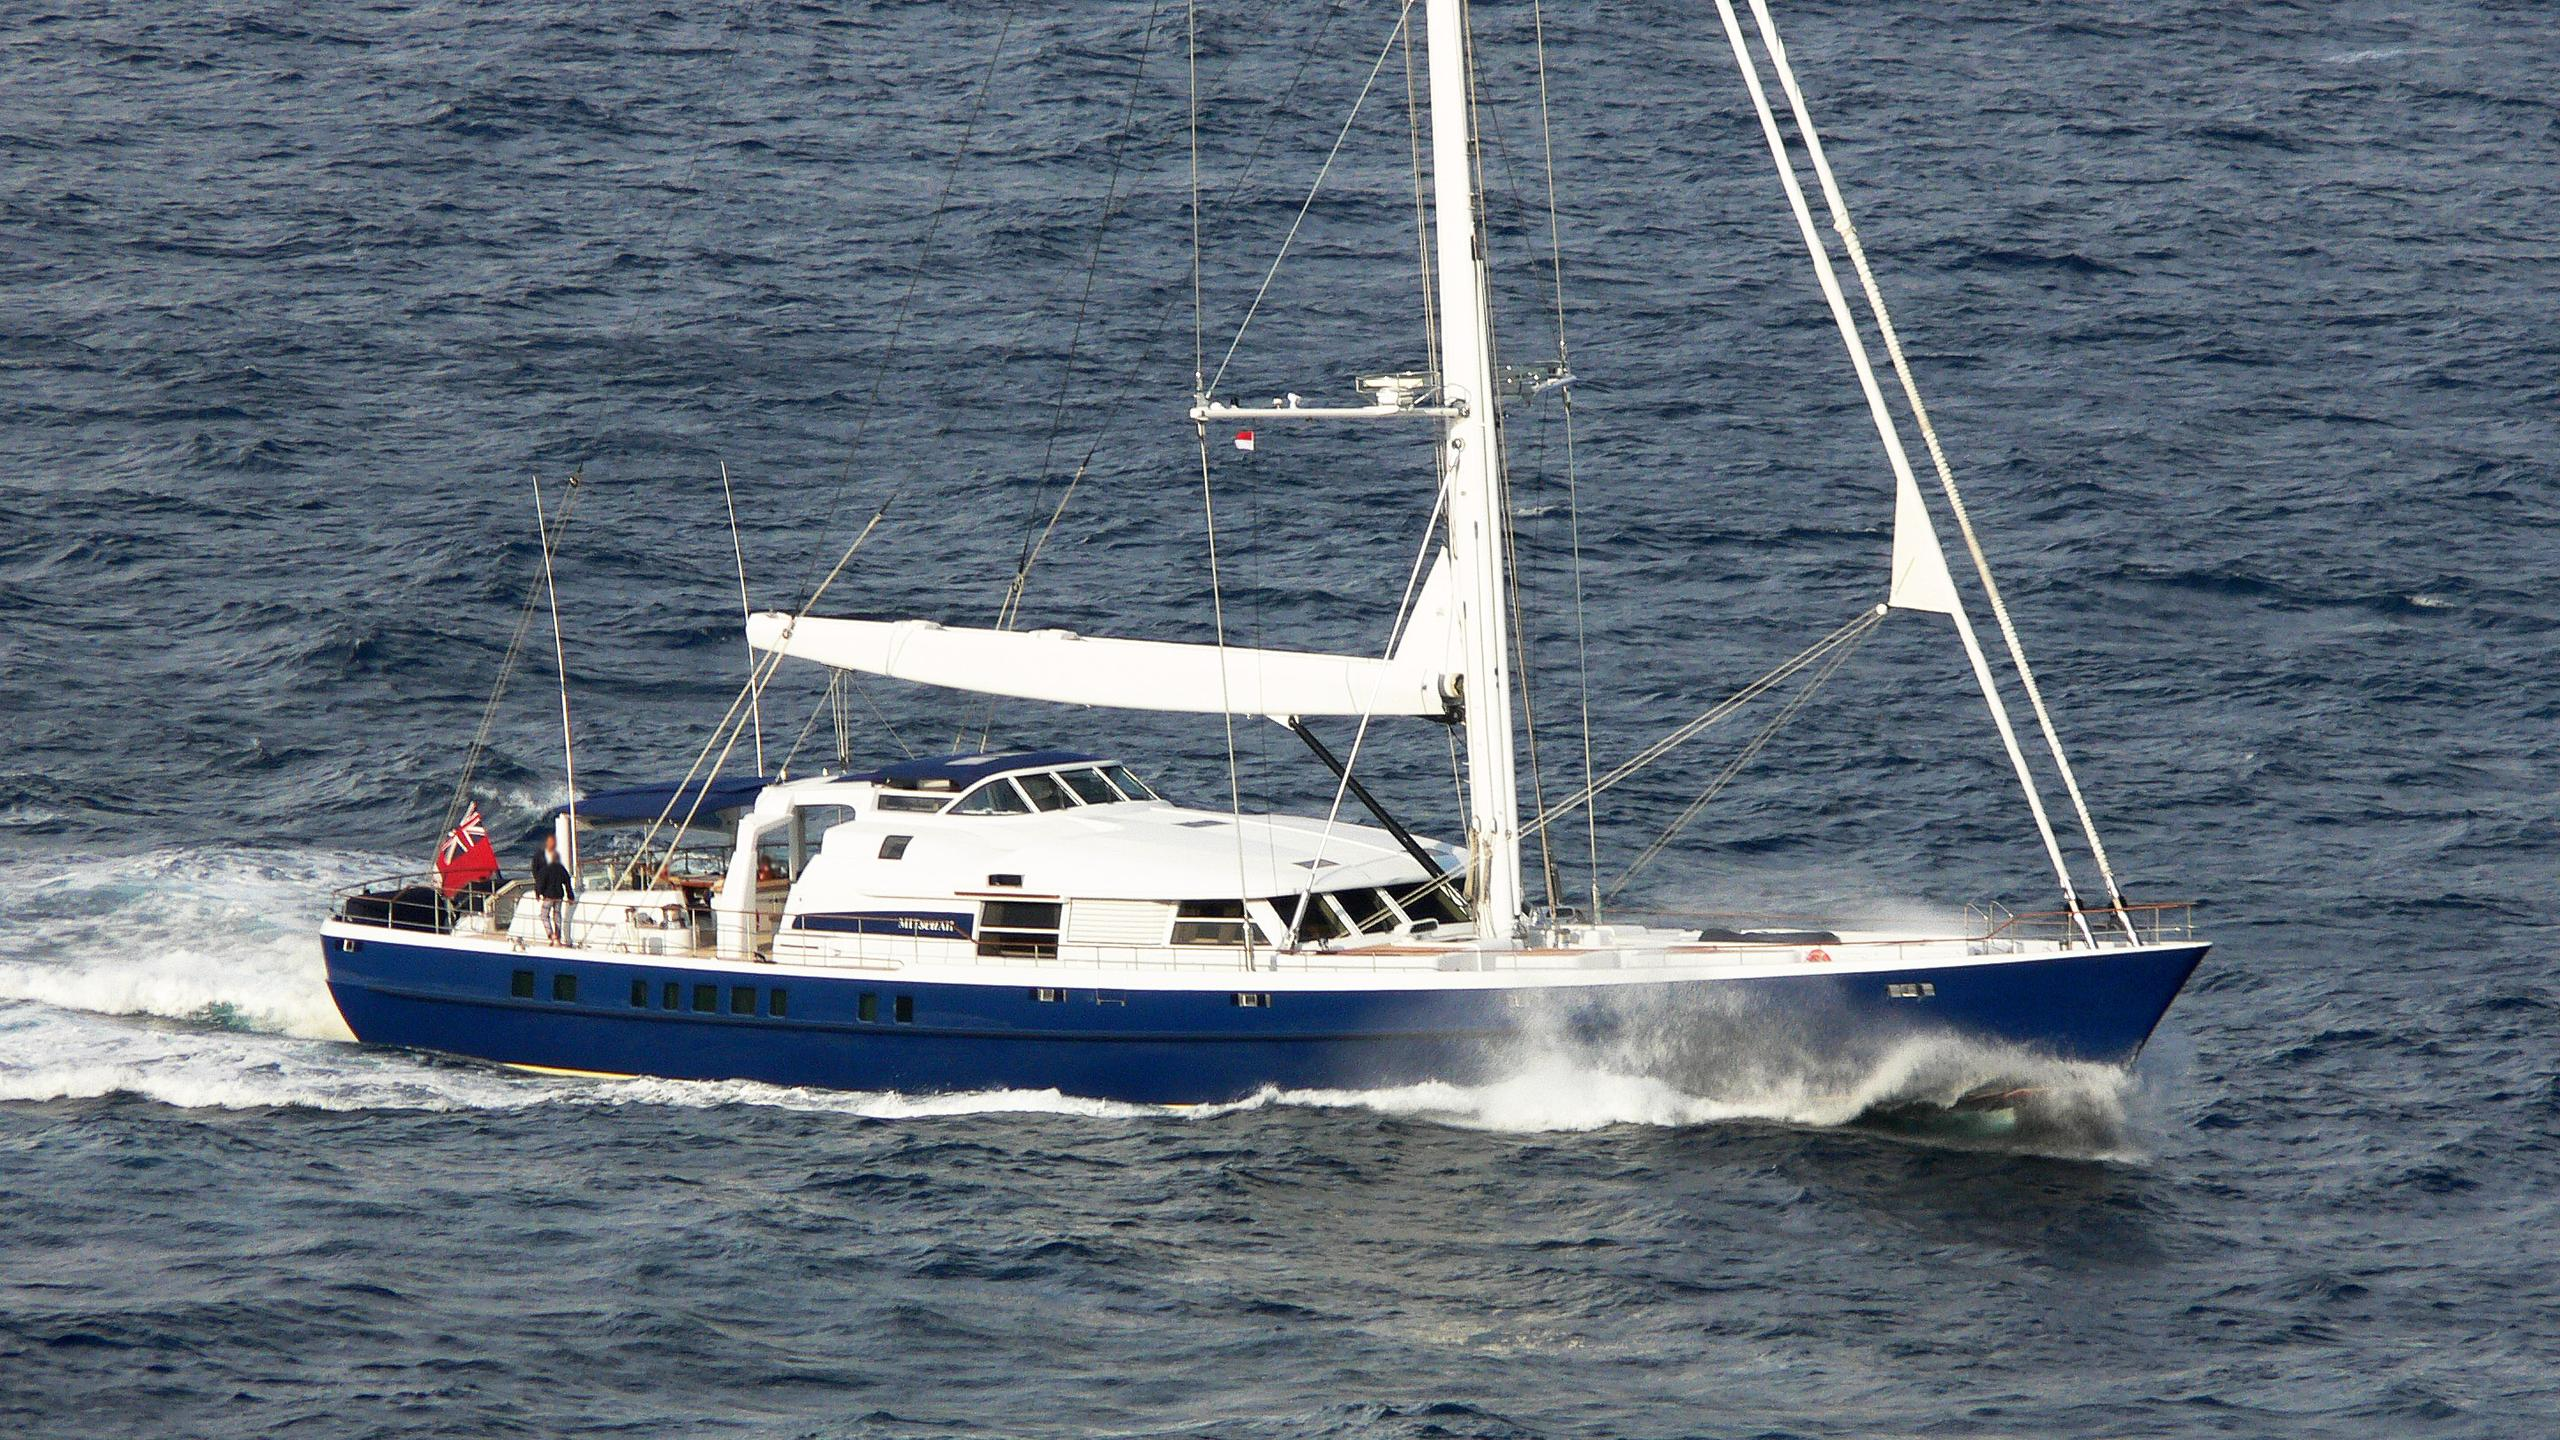 mitseaah-sailing-yacht-pendennis-2004-47m-cruising-half-profile